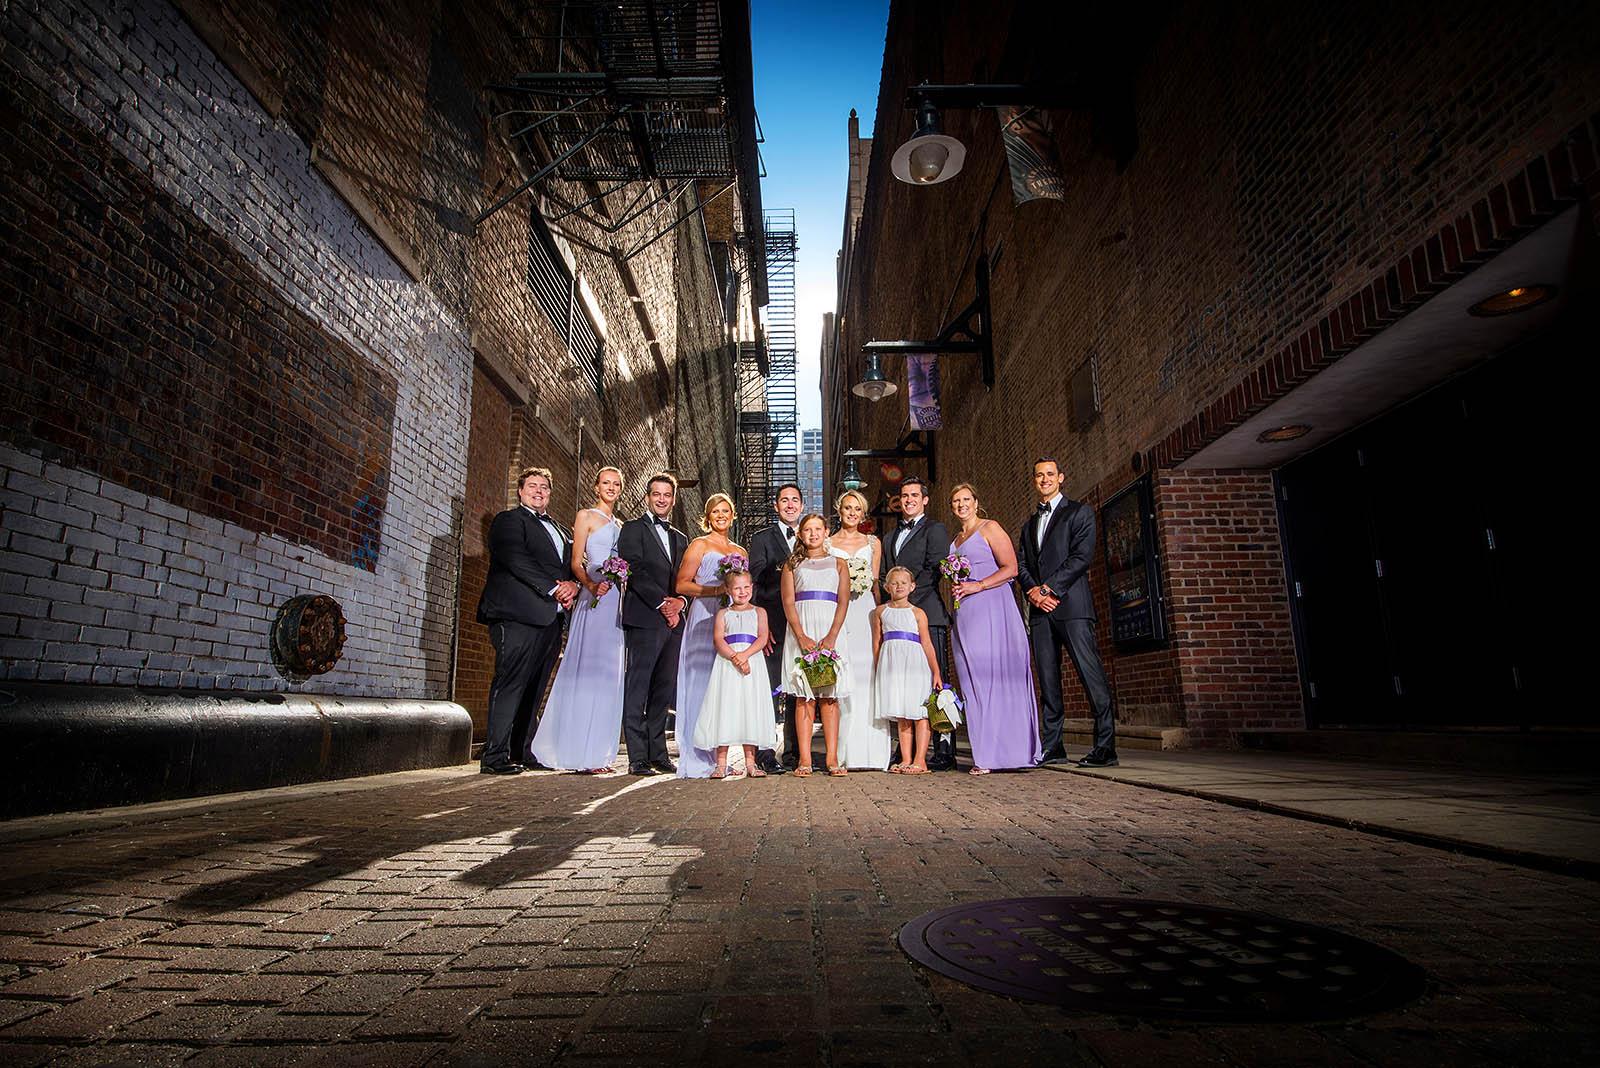 Bridal Party Wedding Photo Alley Chicago